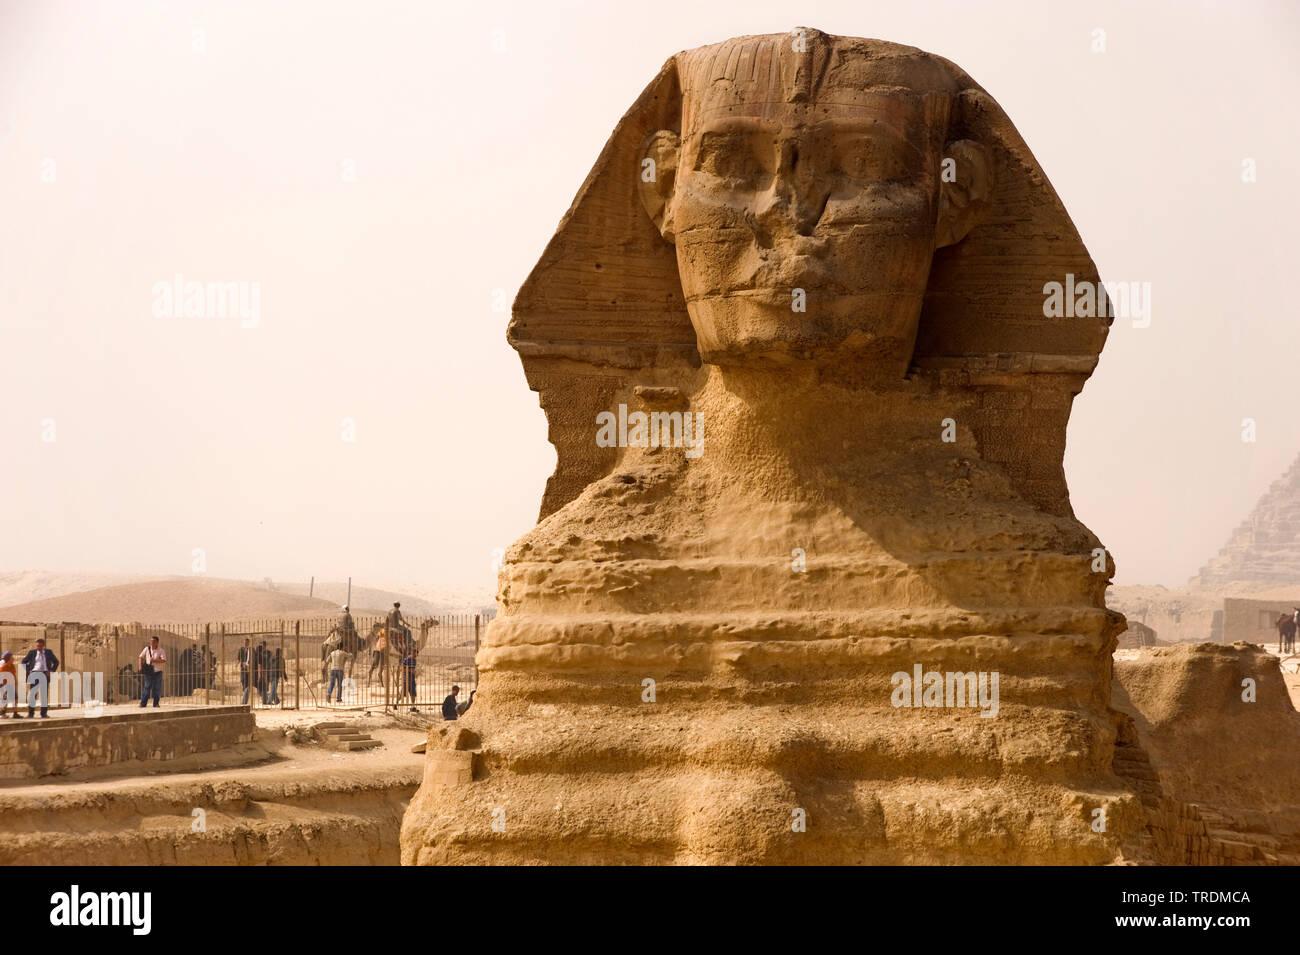 Sphinx of Gizeh, Aegypten, Gizeh | sphinx of Gizeh, Egypt, Gizeh | BLWS506439.jpg [ (c) blickwinkel/McPHOTO/M. Begsteiger Tel. +49 (0)2302-2793220, E- - Stock Image